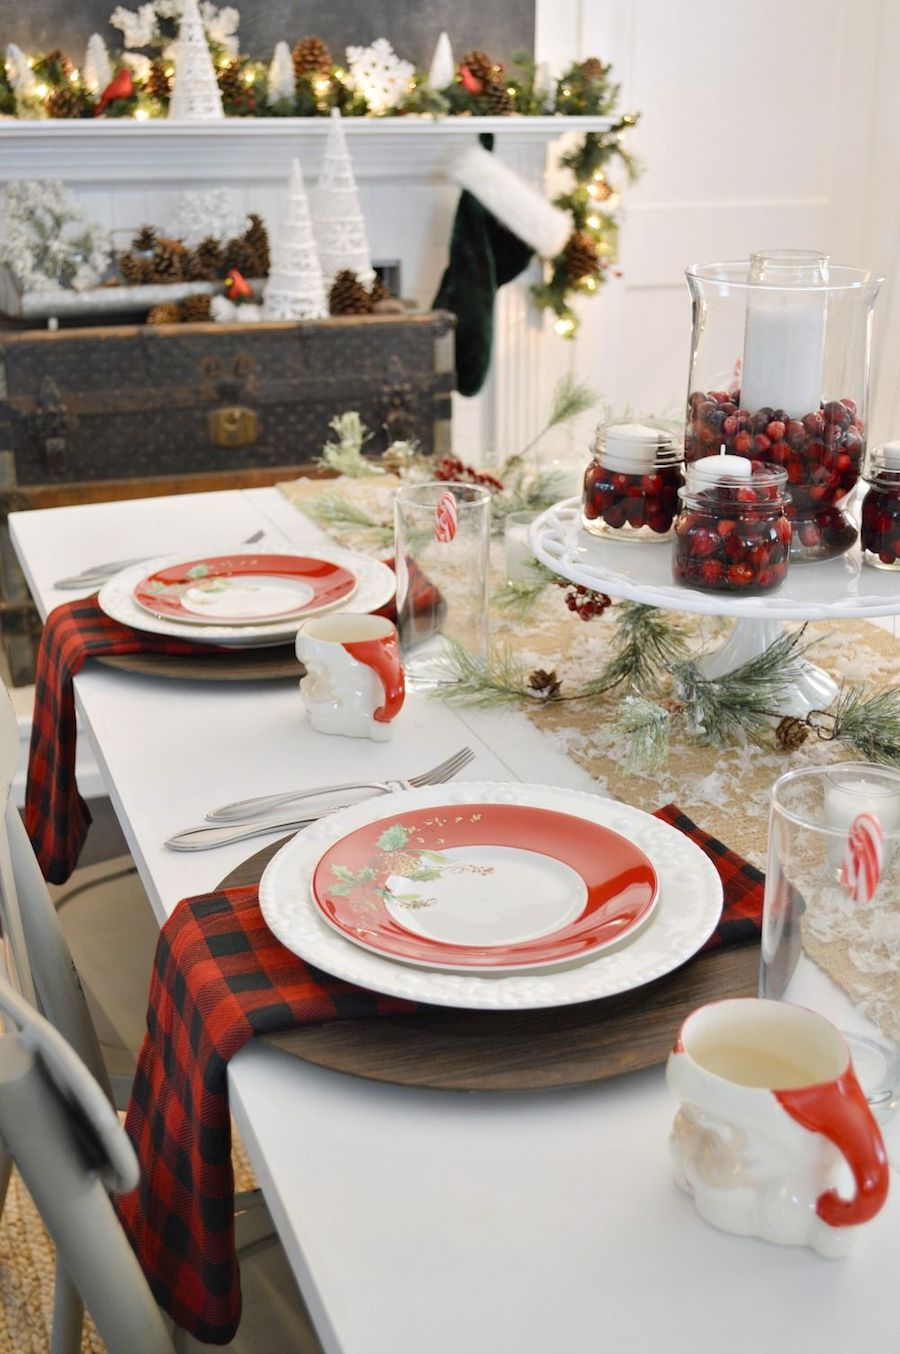 Cottage Farmhouse Christmas Dining Room Decor via foxhollowcottage #ChristmasDecor #ChristmasDiningRoom